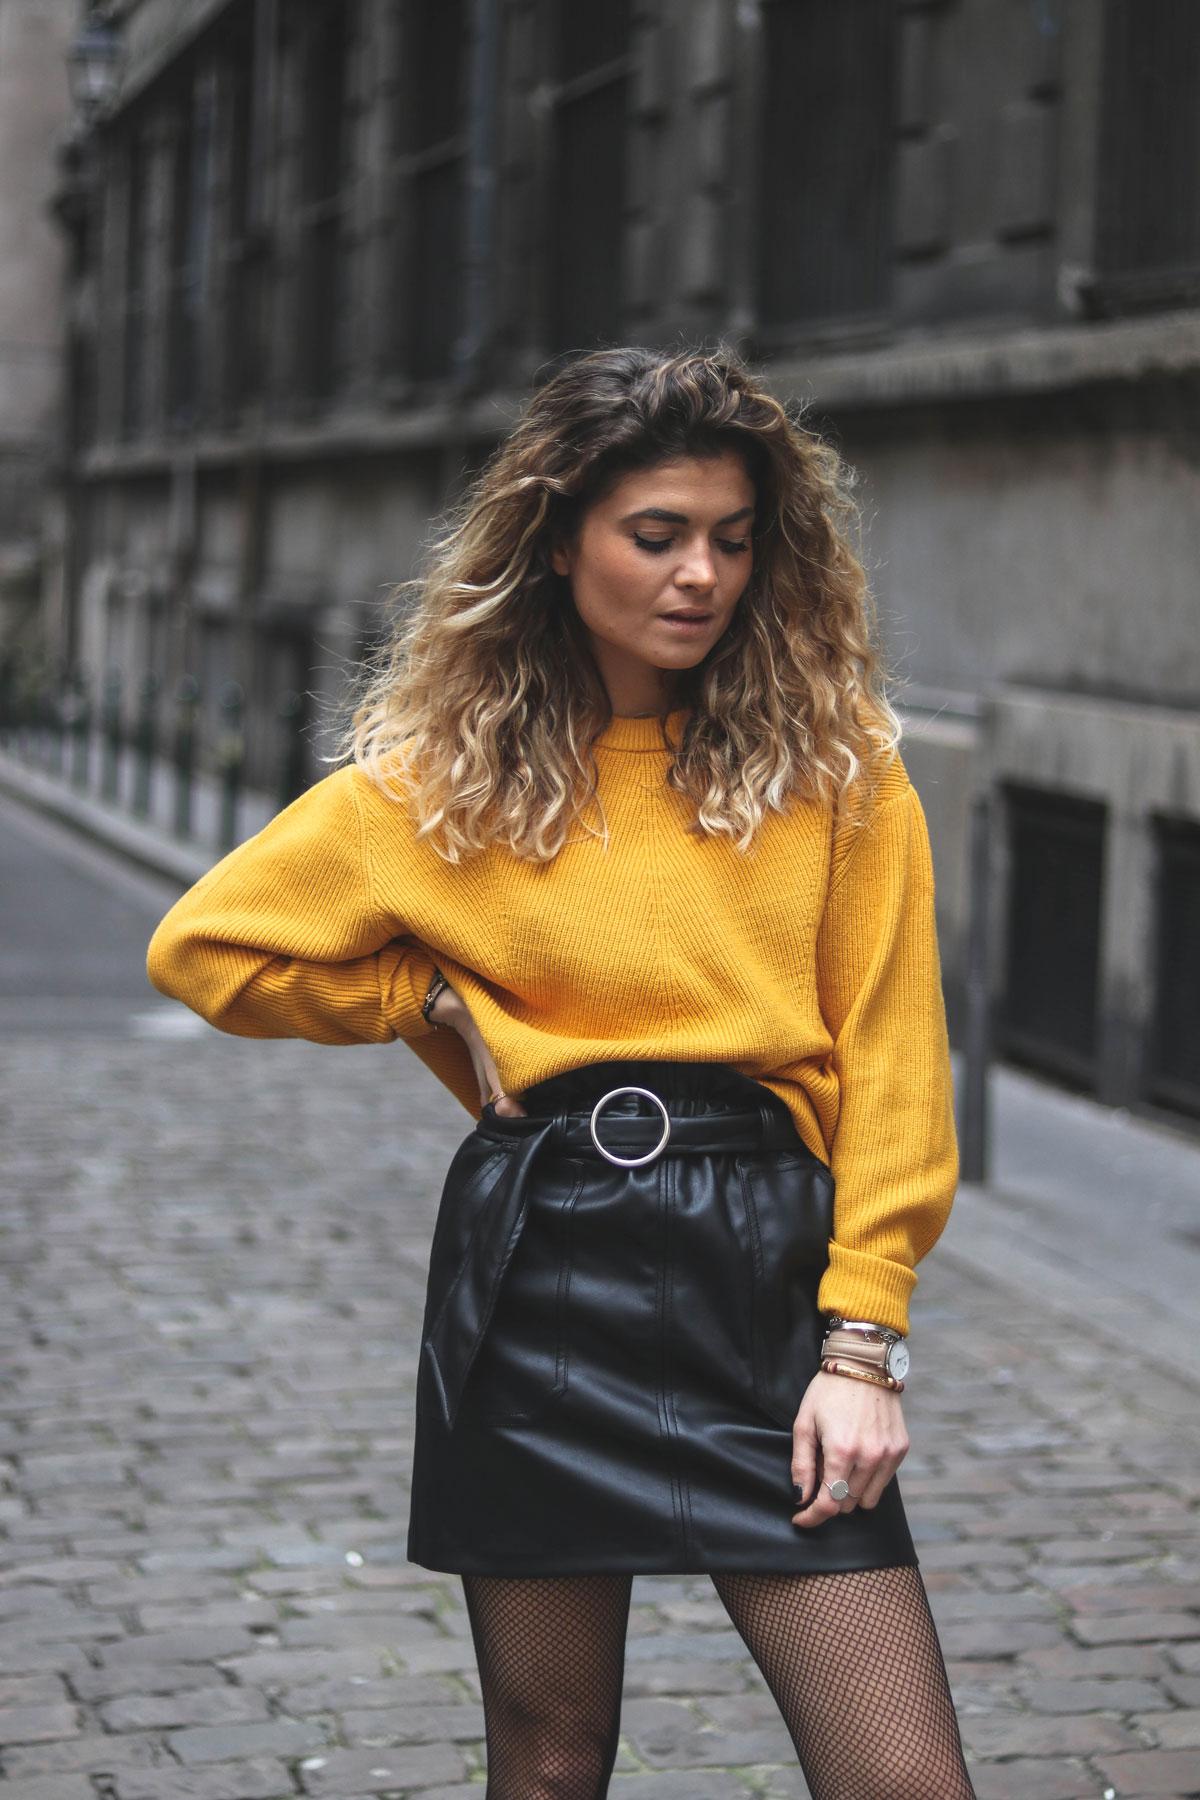 tendance couleur jaune printemps 2018 marie and mood